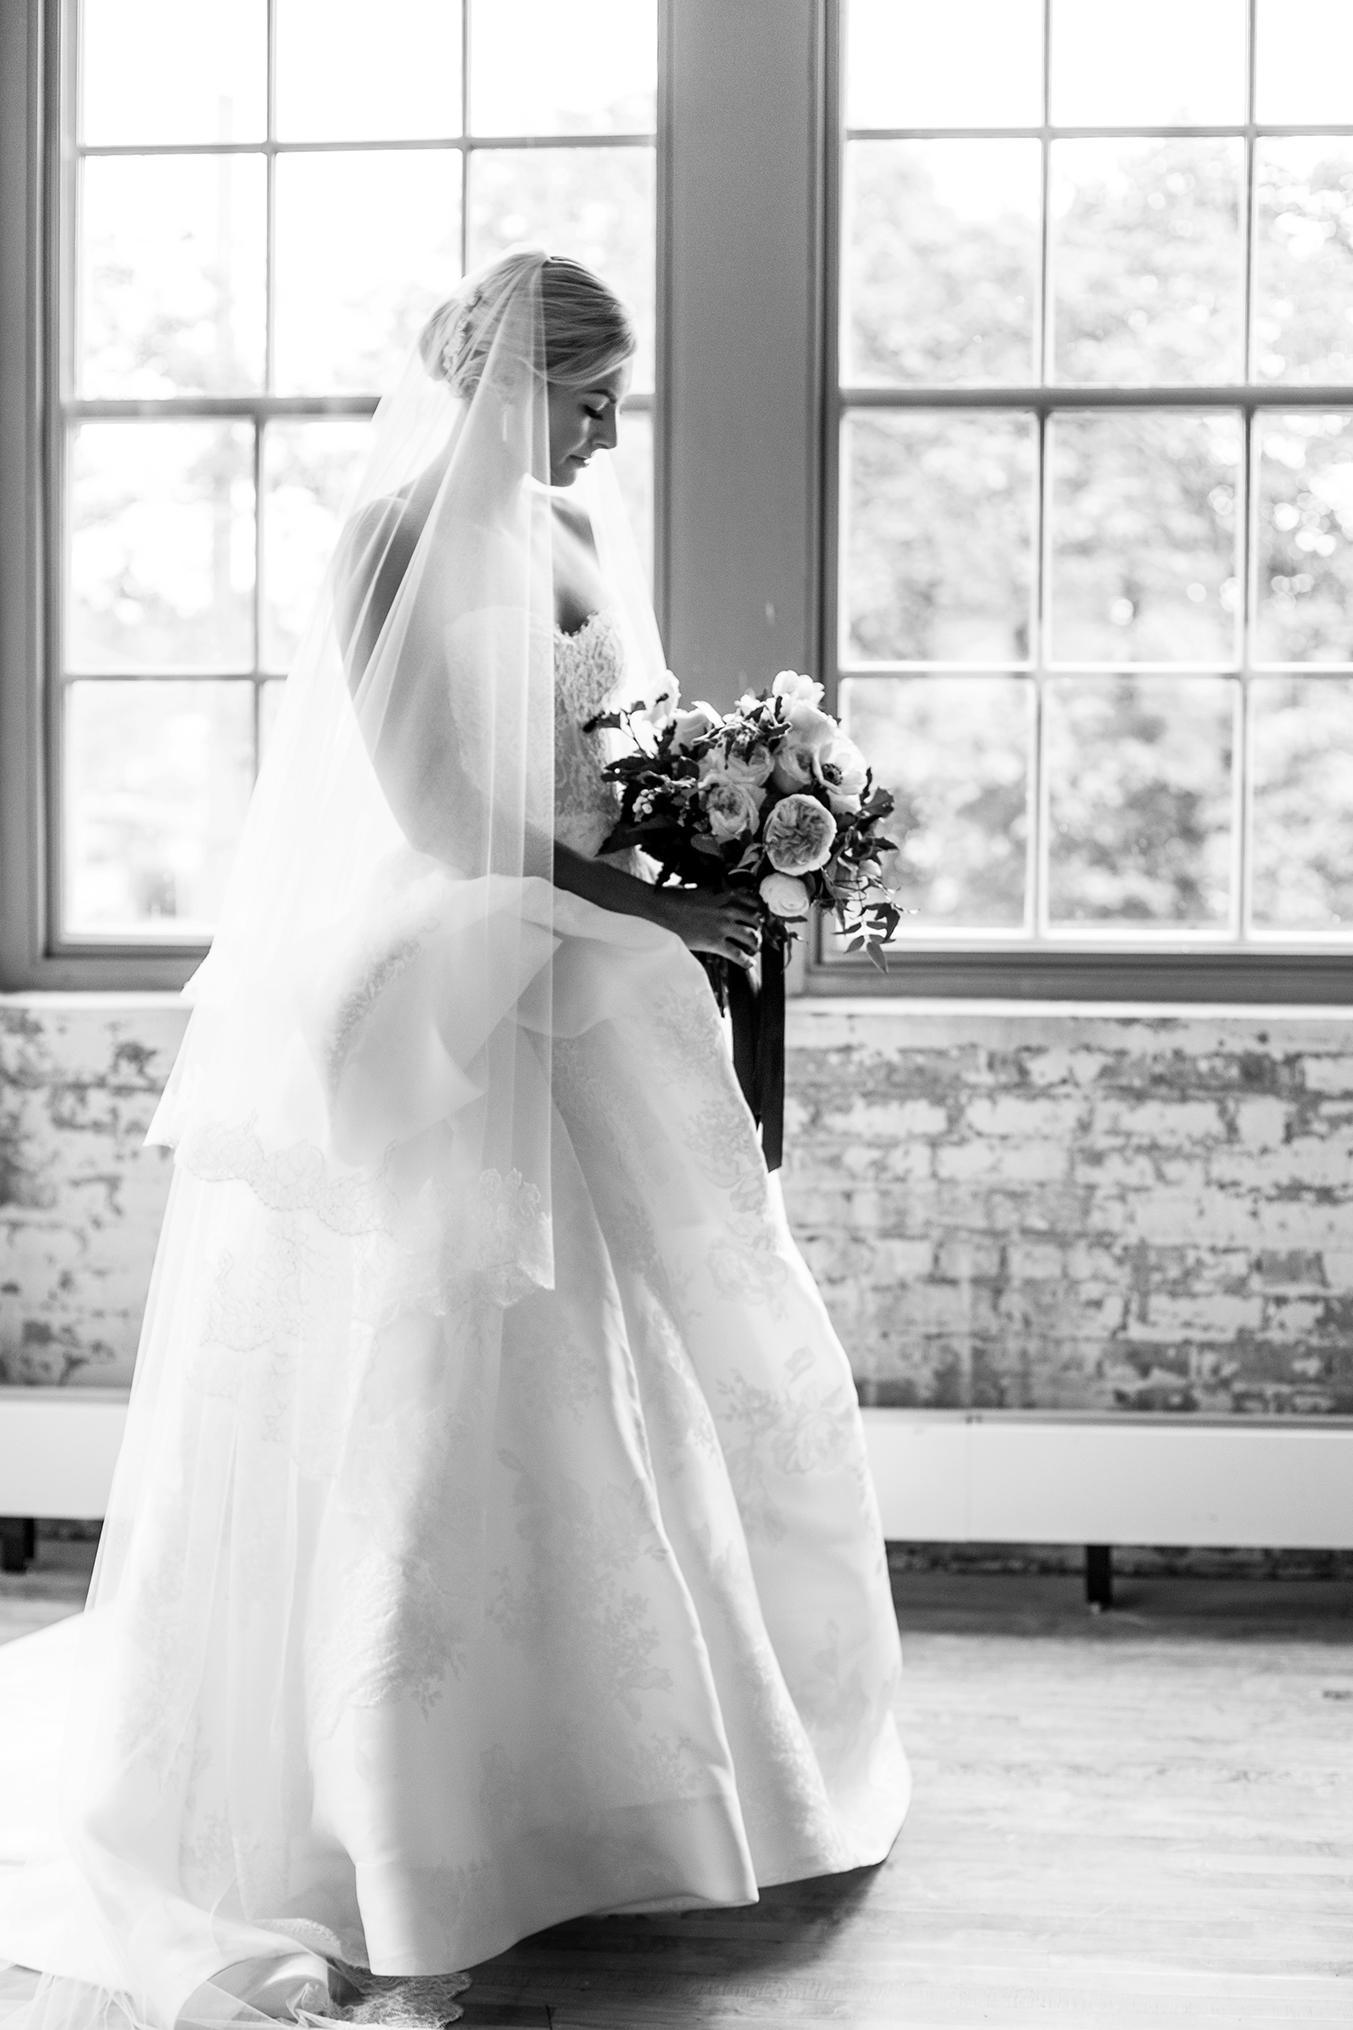 MPLS best wedding photographer